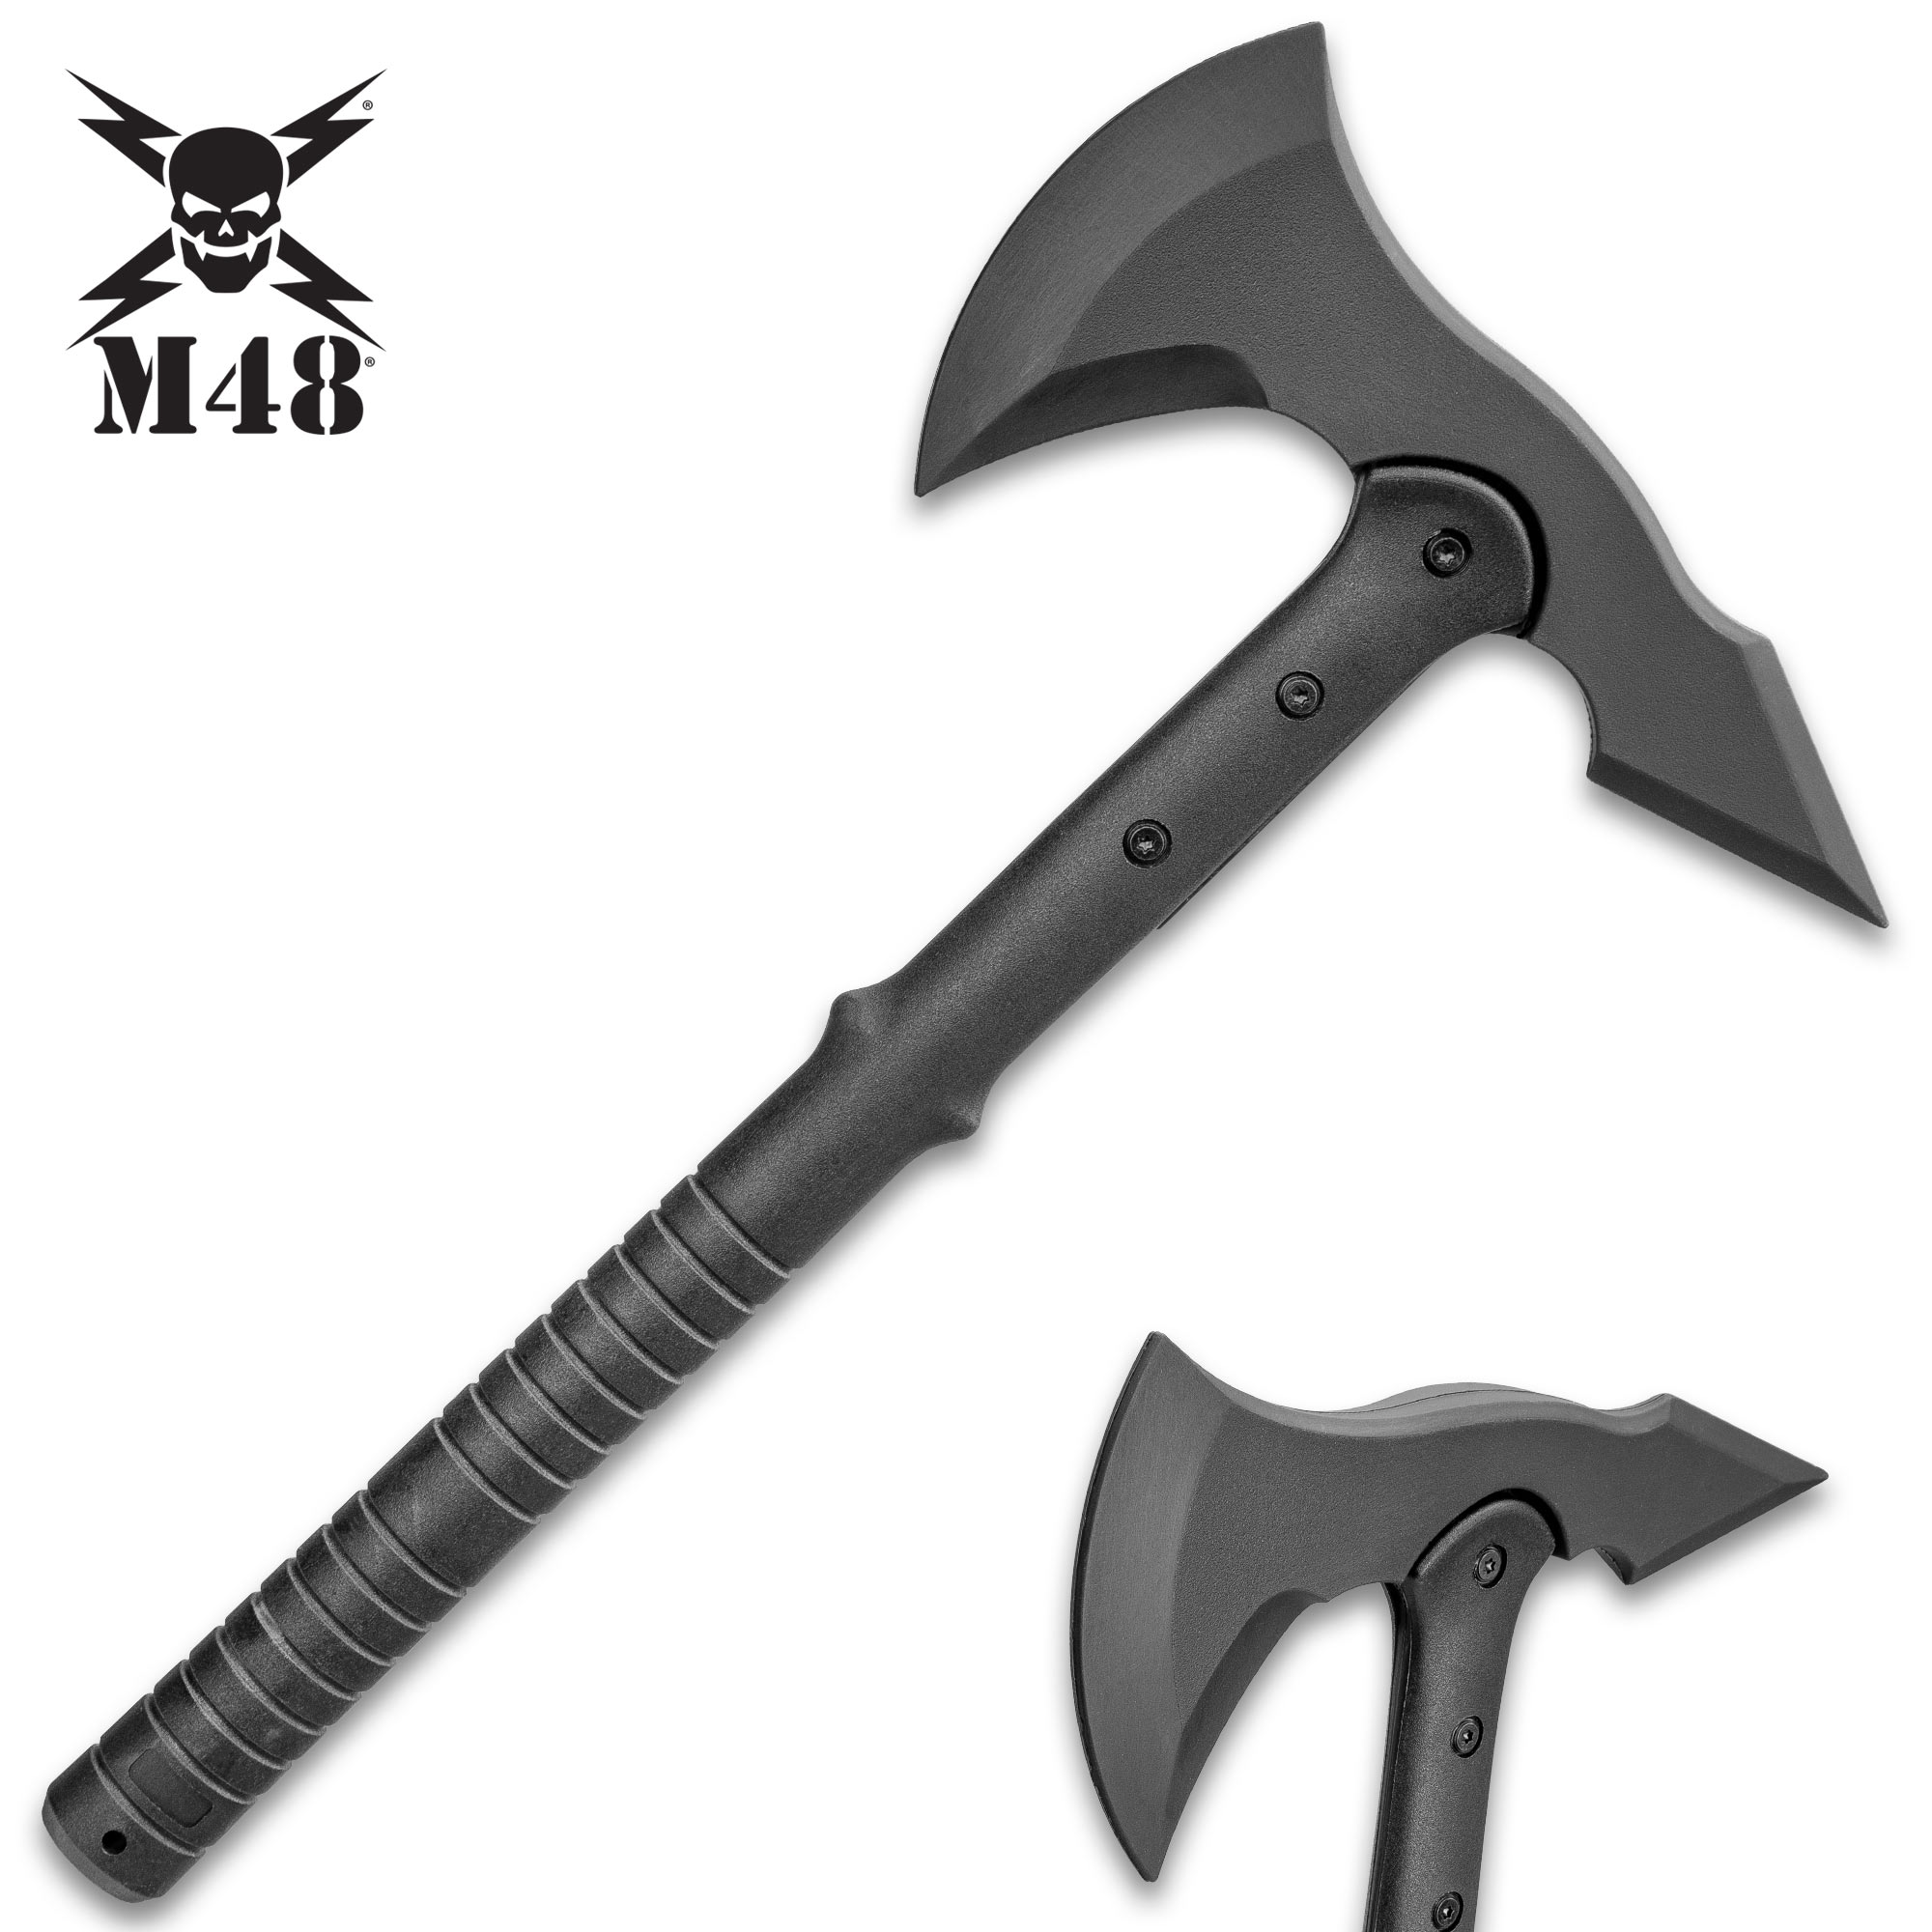 M48 Tomahawk Training Weapon - Solid Polypropylene